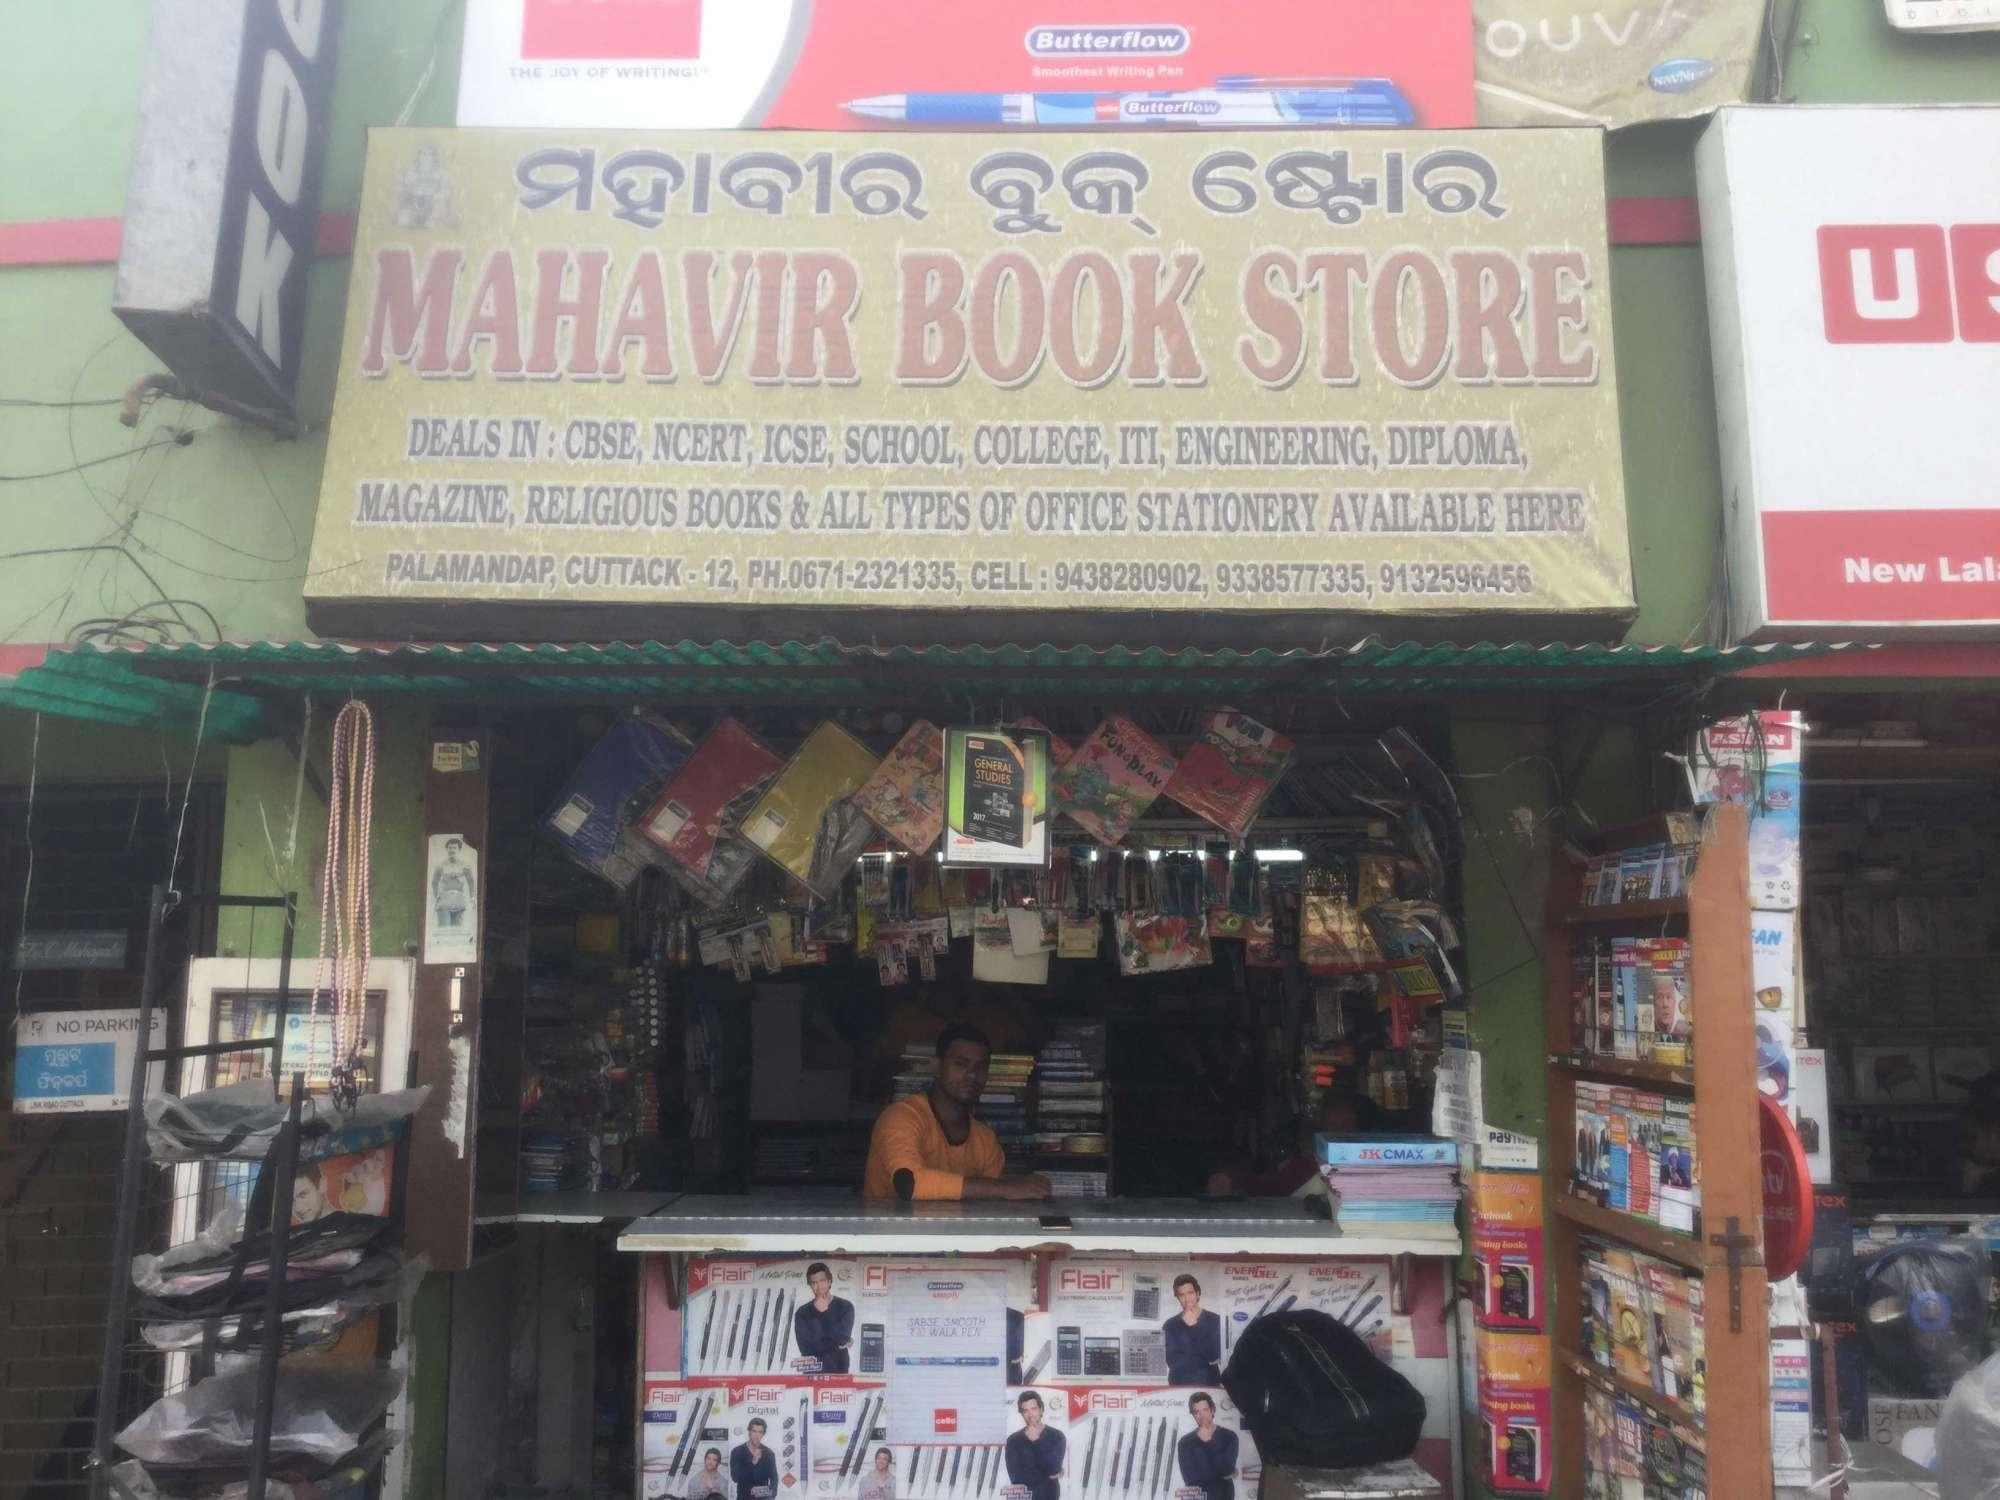 Top Religious Book Dealers in Arunodaya Market - Best